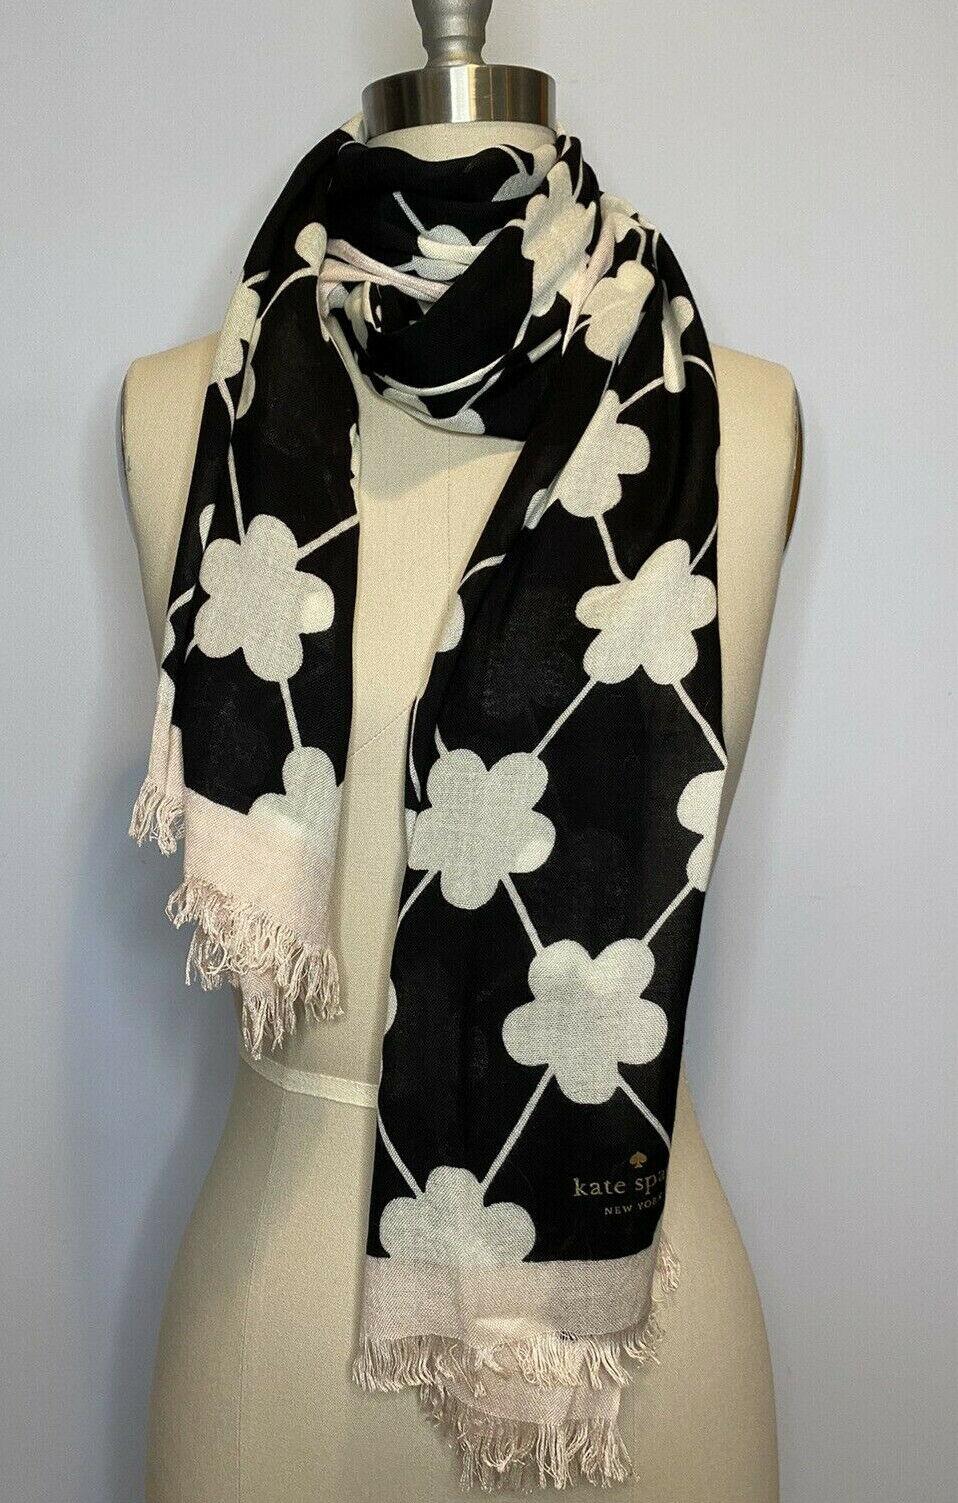 Kate spade festive flower scarf wrap pink black white floral